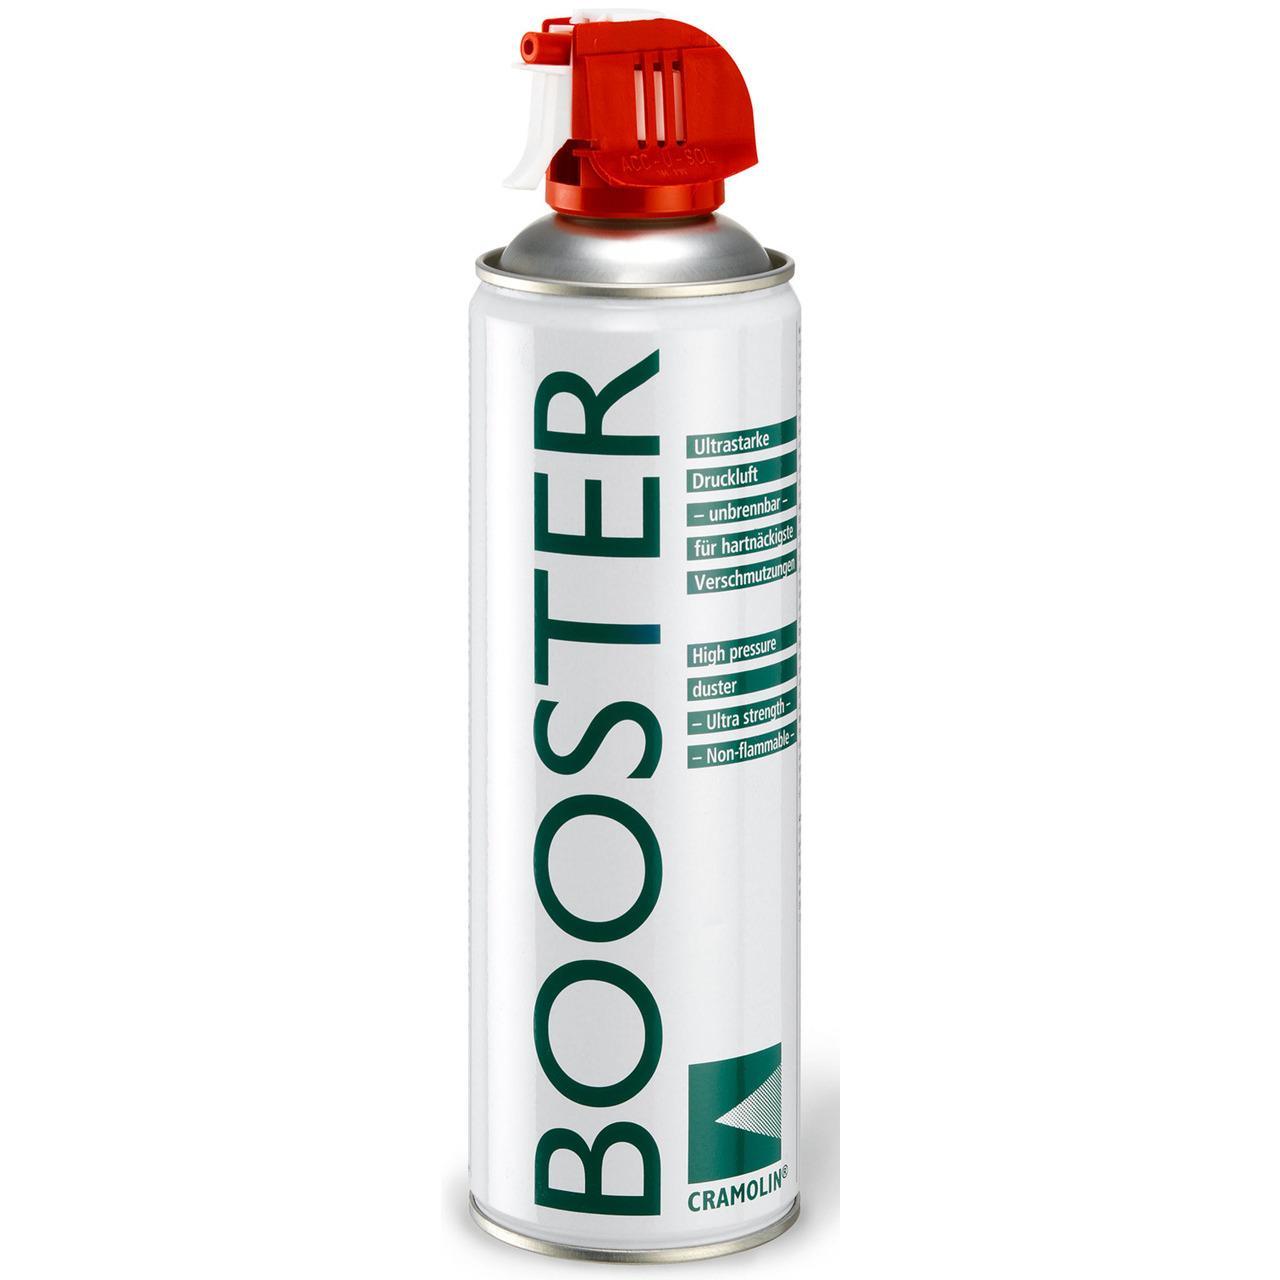 ITW Cramolin Booster Druckluft, 500 g